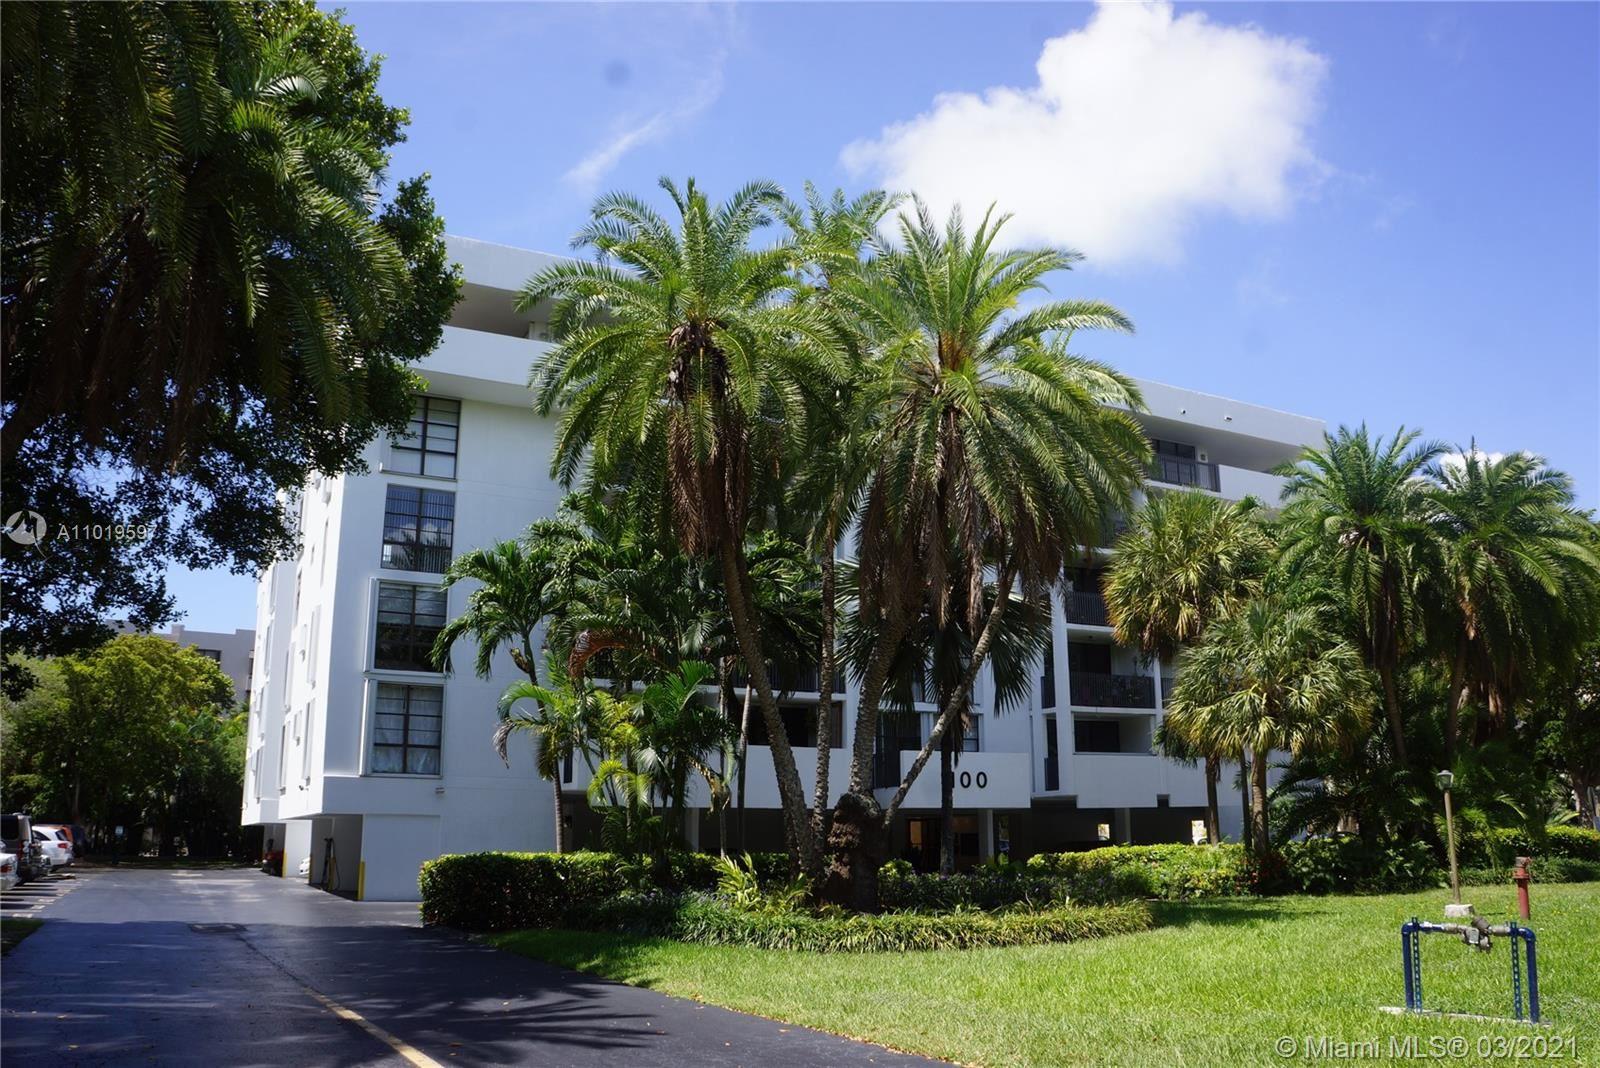 100 Ocean Lane Dr #404, Key Biscayne, FL 33149 - #: A11019597